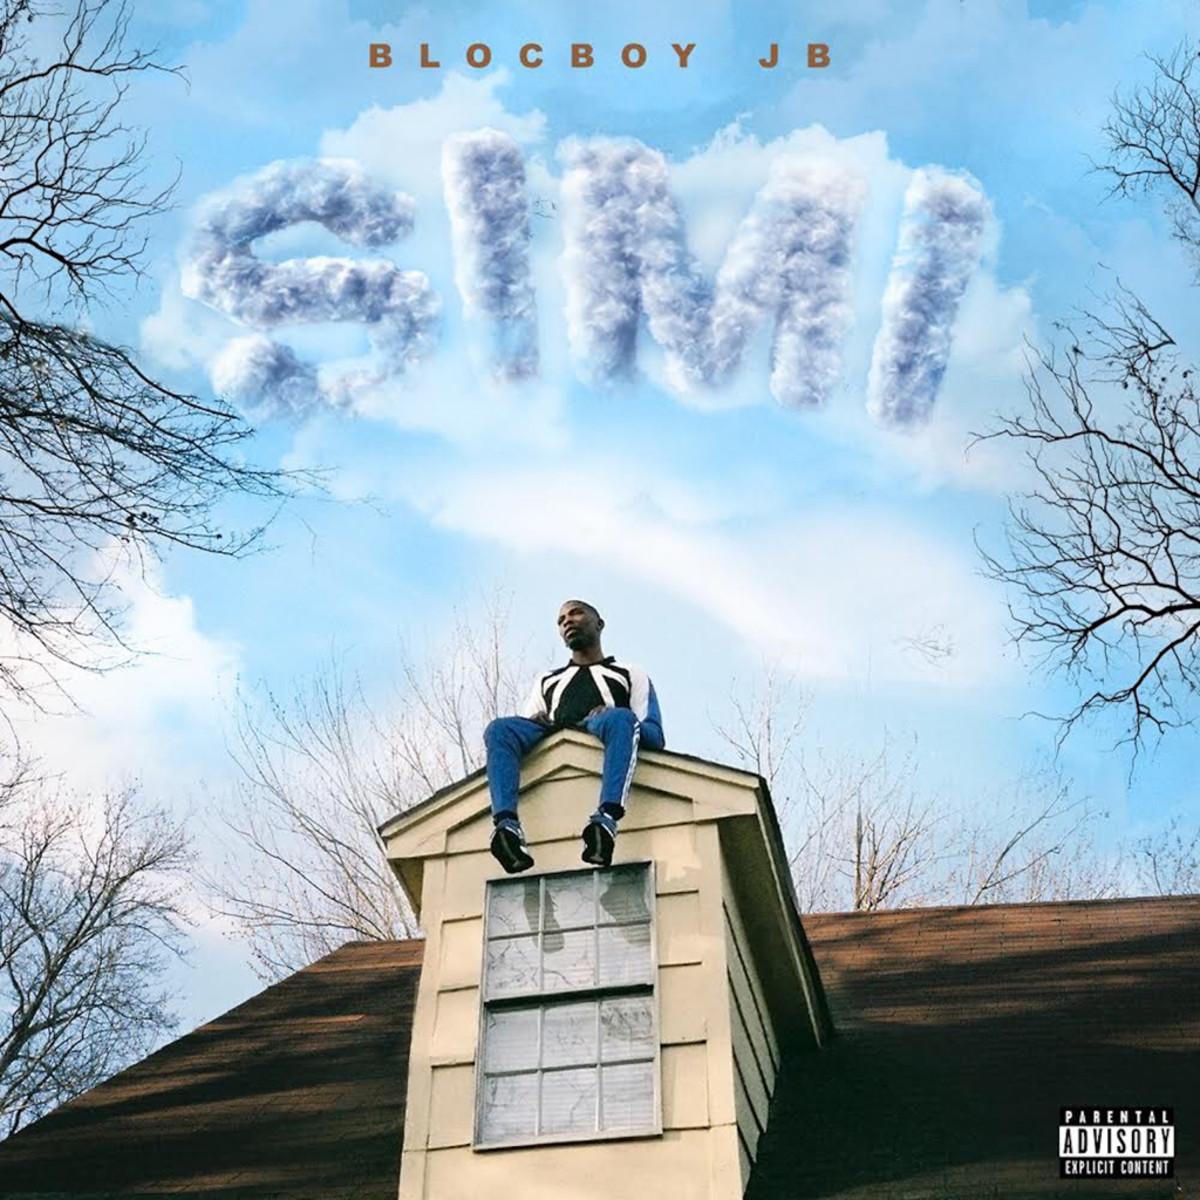 blocboy-jb-simi-art